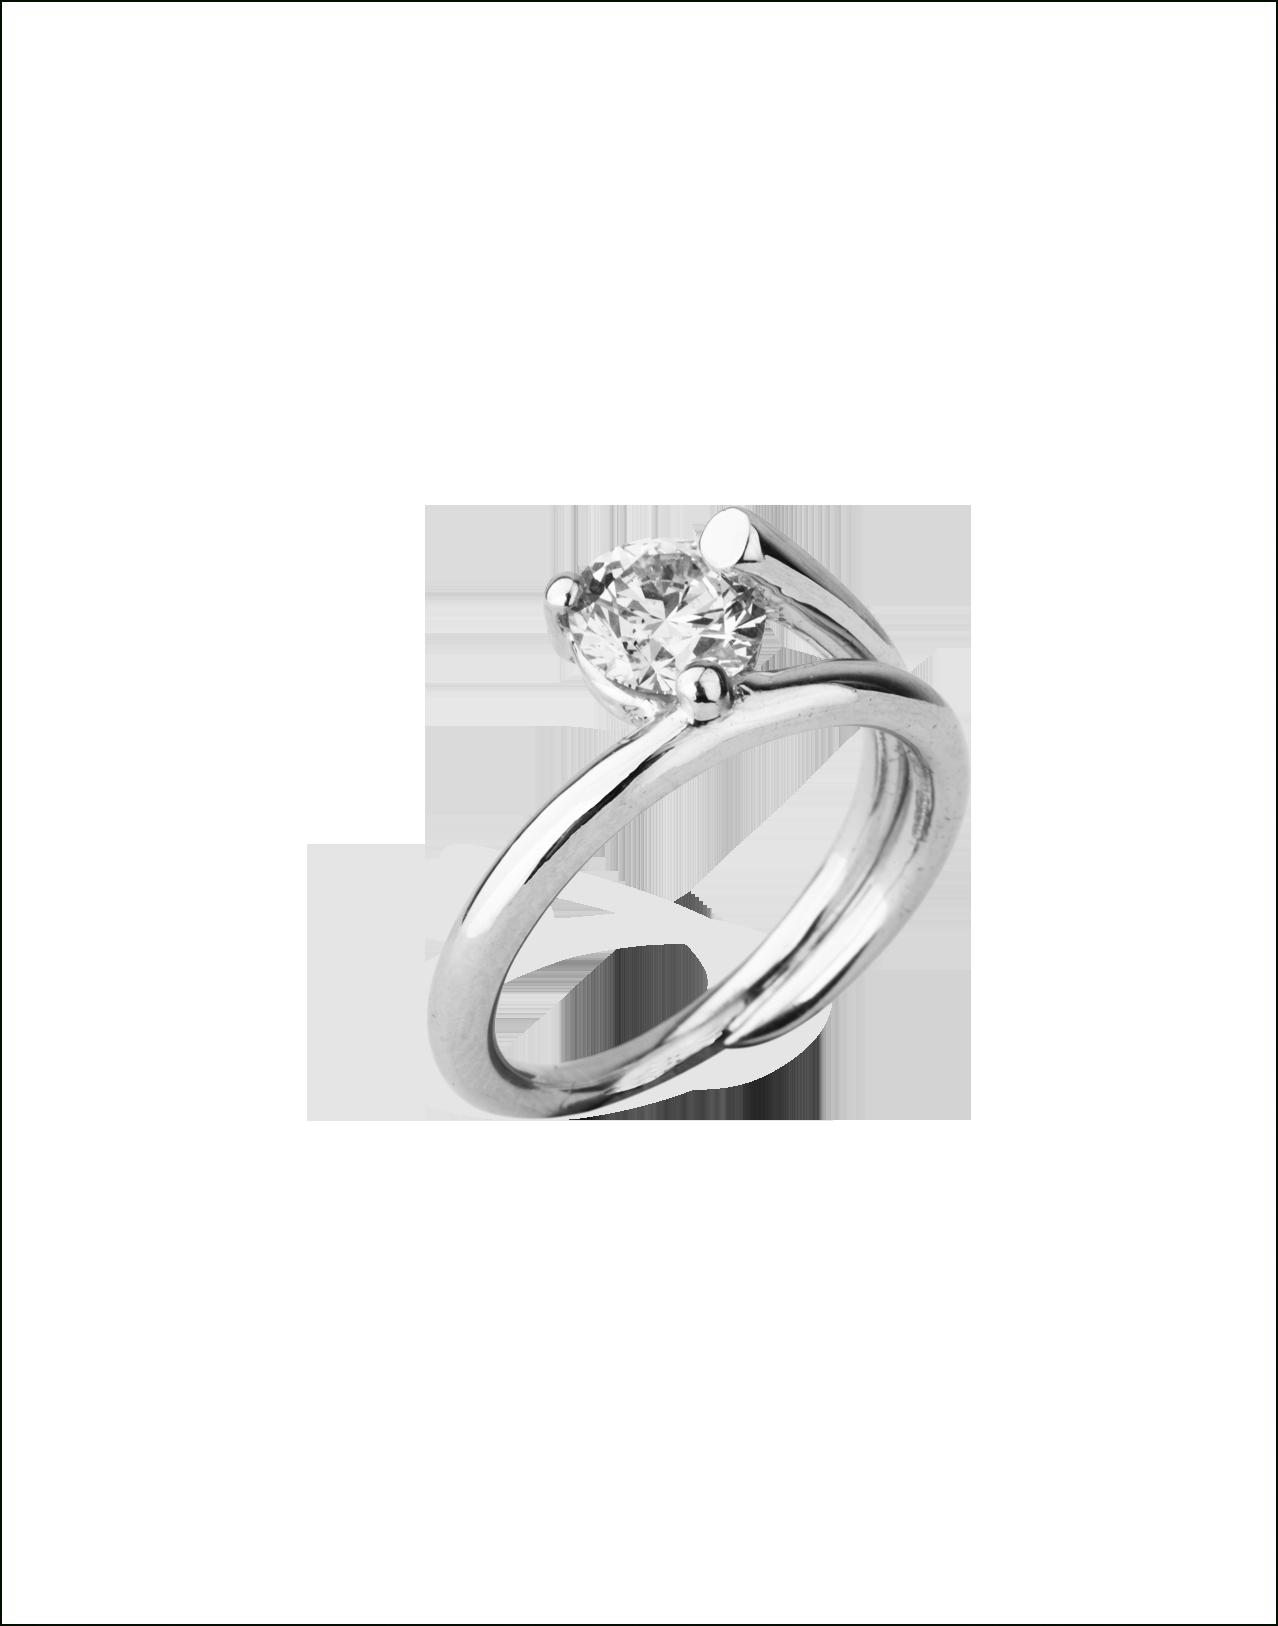 Completedworks-Subverted-Flower-Bridal-Ring-WHITE-GOLD-5-1.png